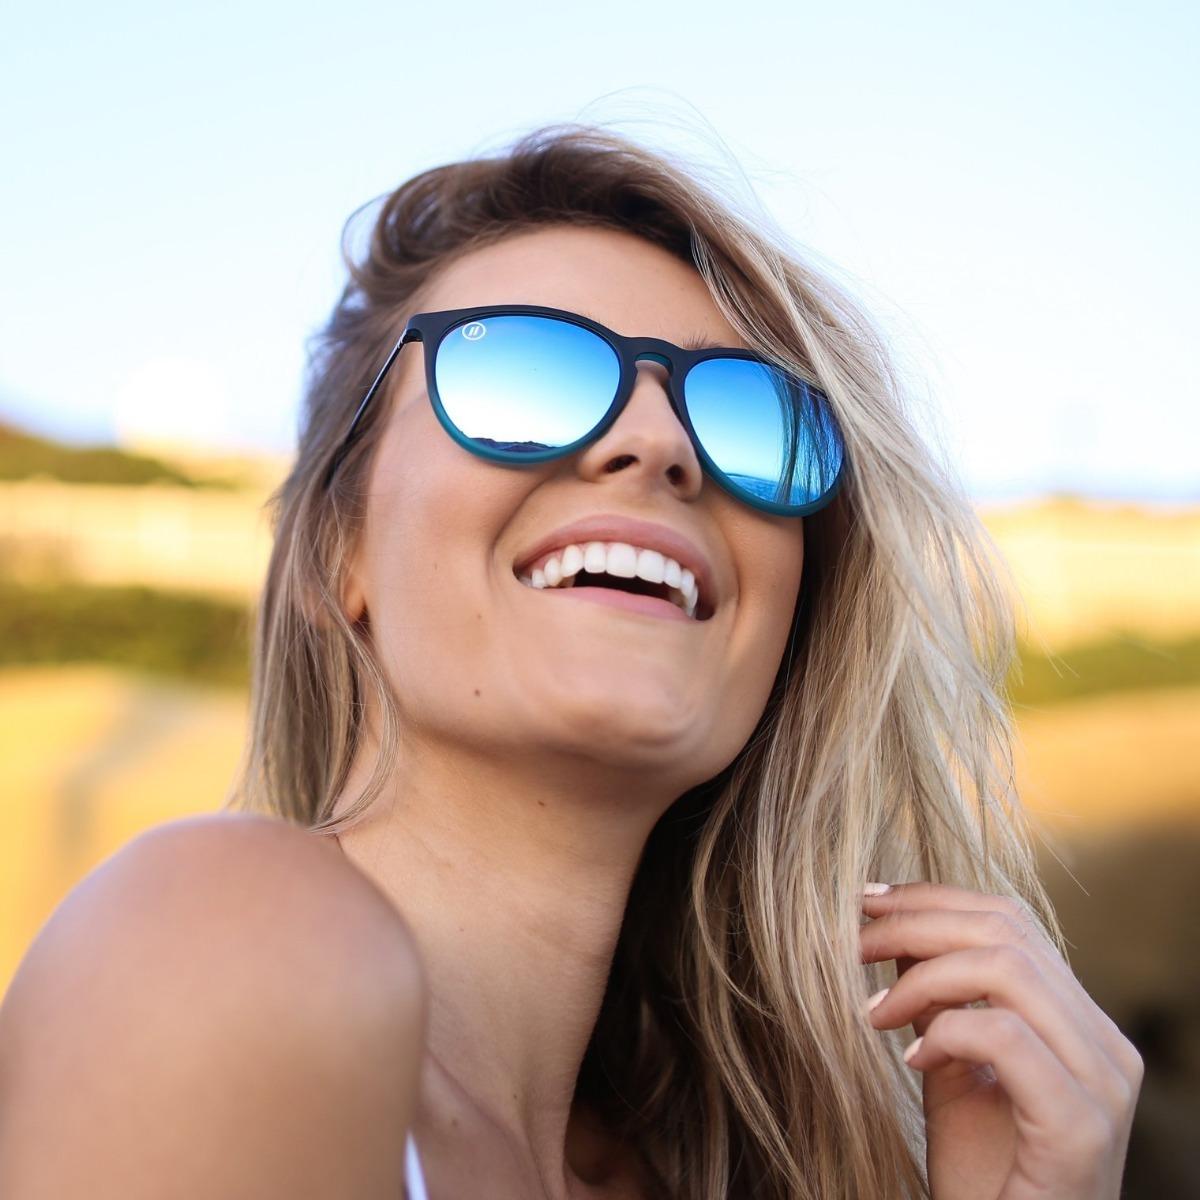 Óculos De Sol Blenders Fifth Avenue Flash Feminino - R  415,00 em ... 888301349e